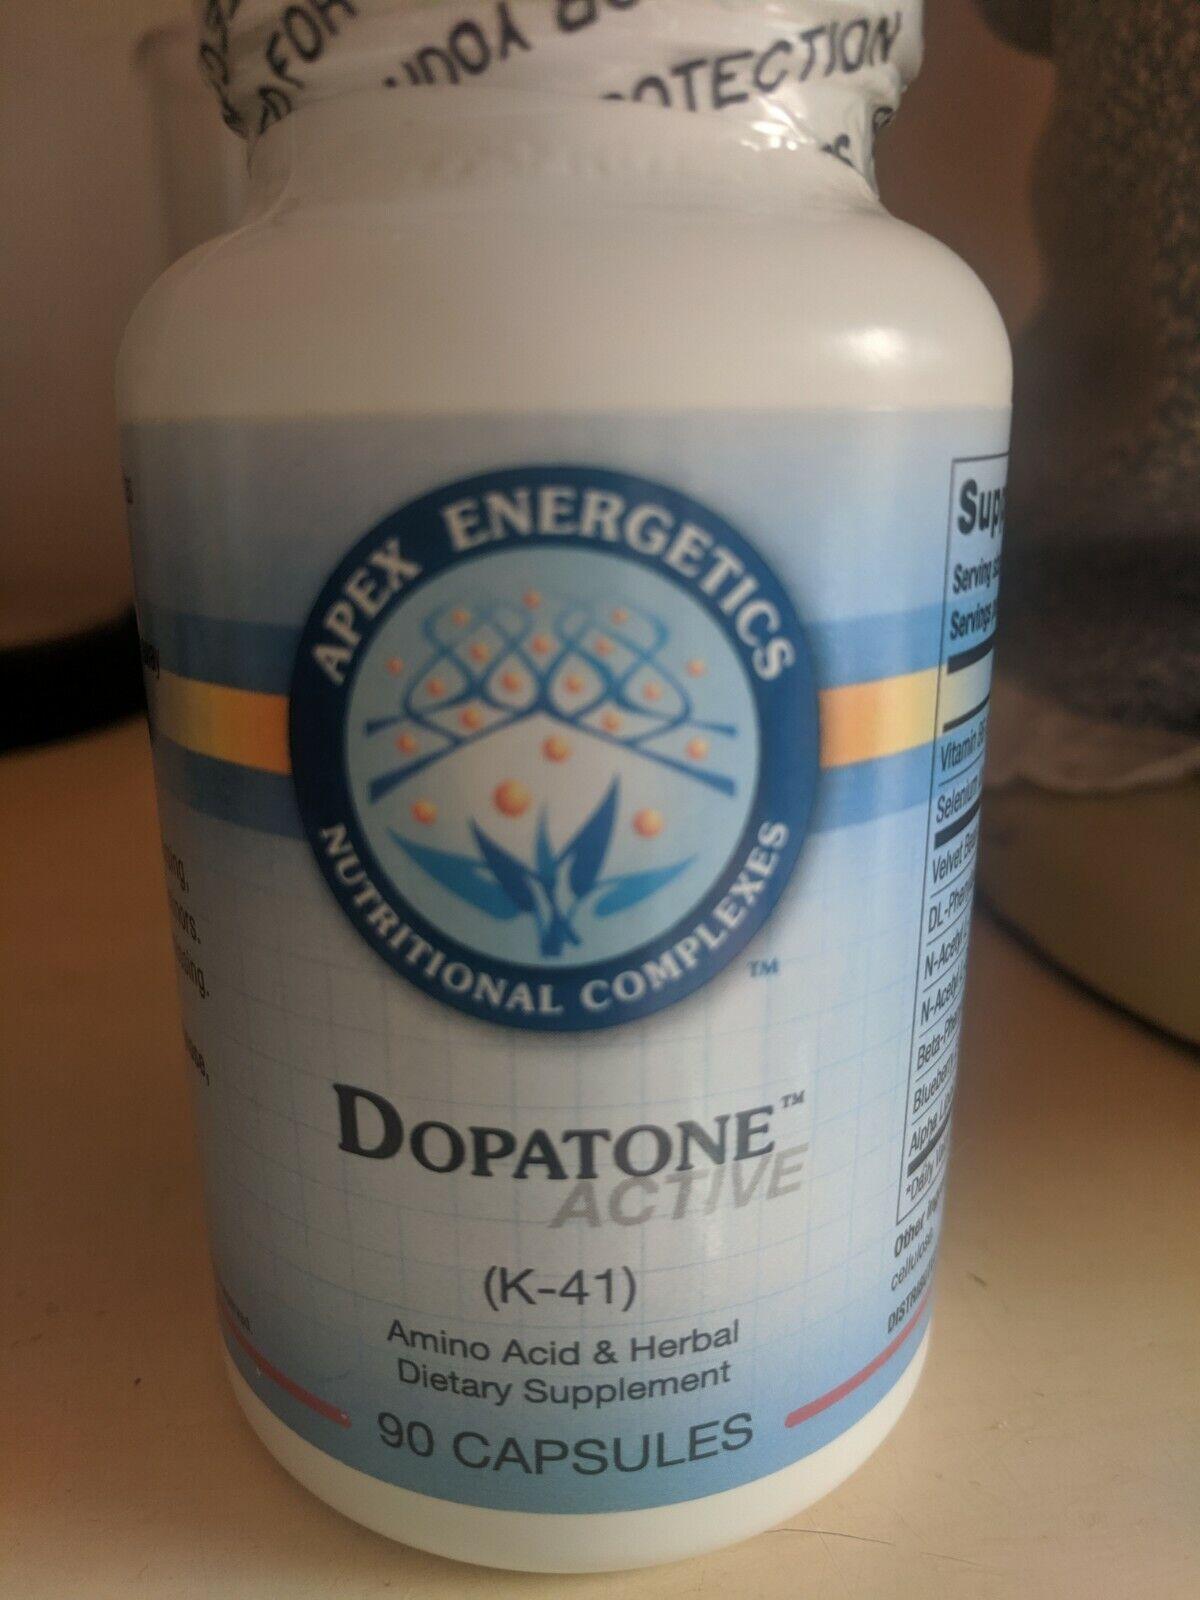 Apex Energetics Dopatone Active 90 Capsules (K-41) FREE SHIPPING